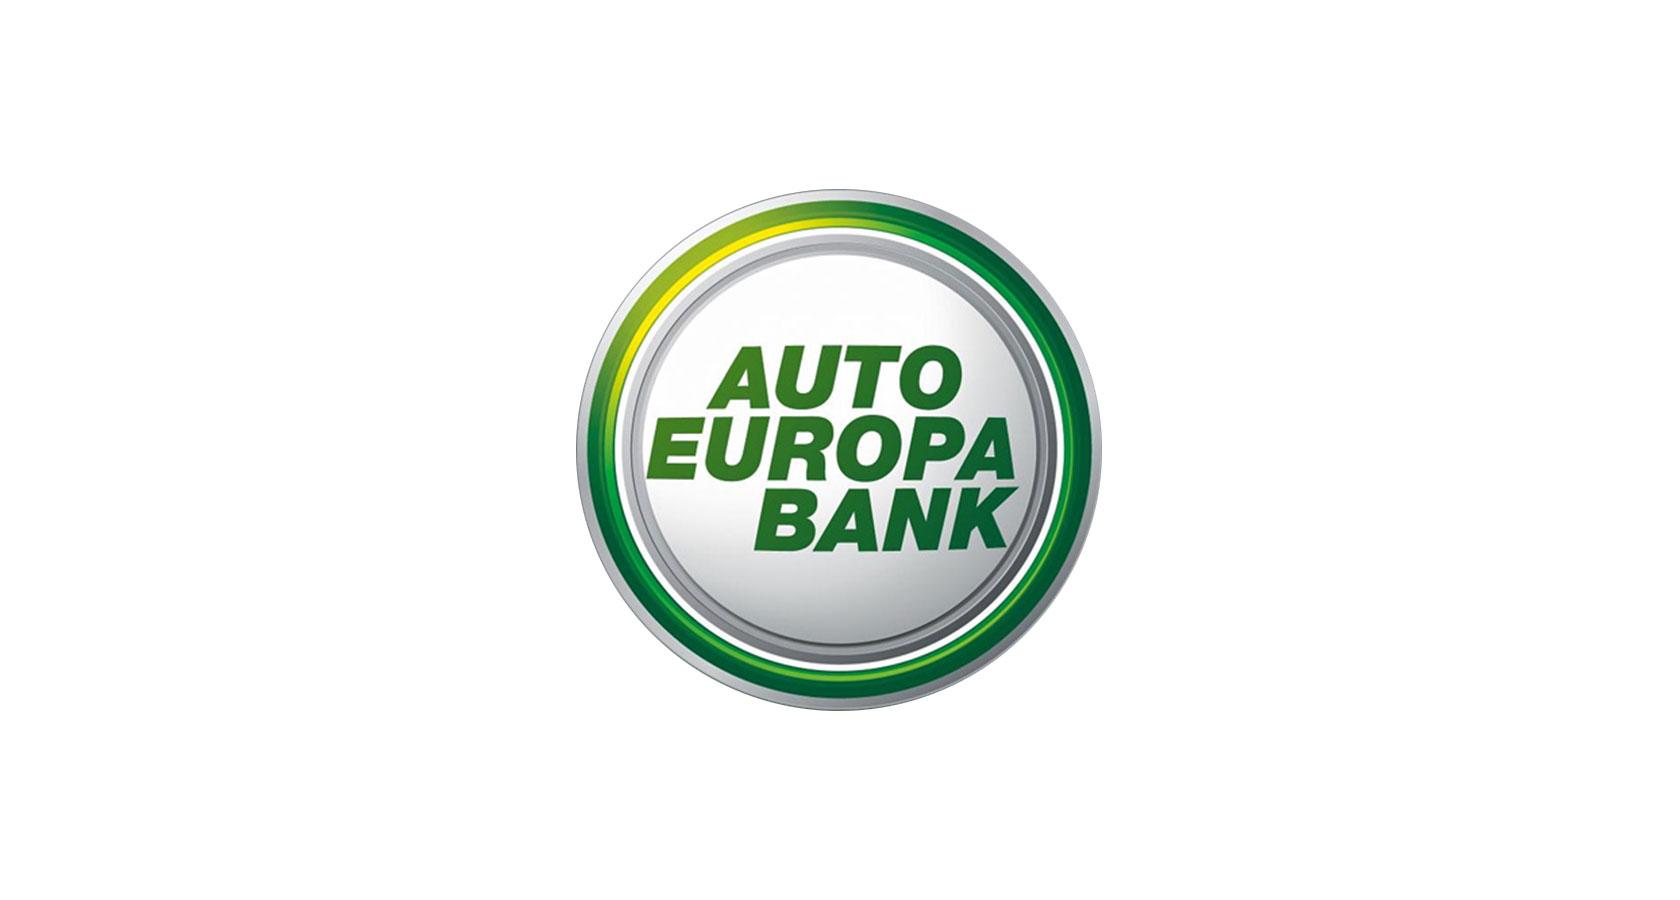 Logo der AutoEuropa Bank